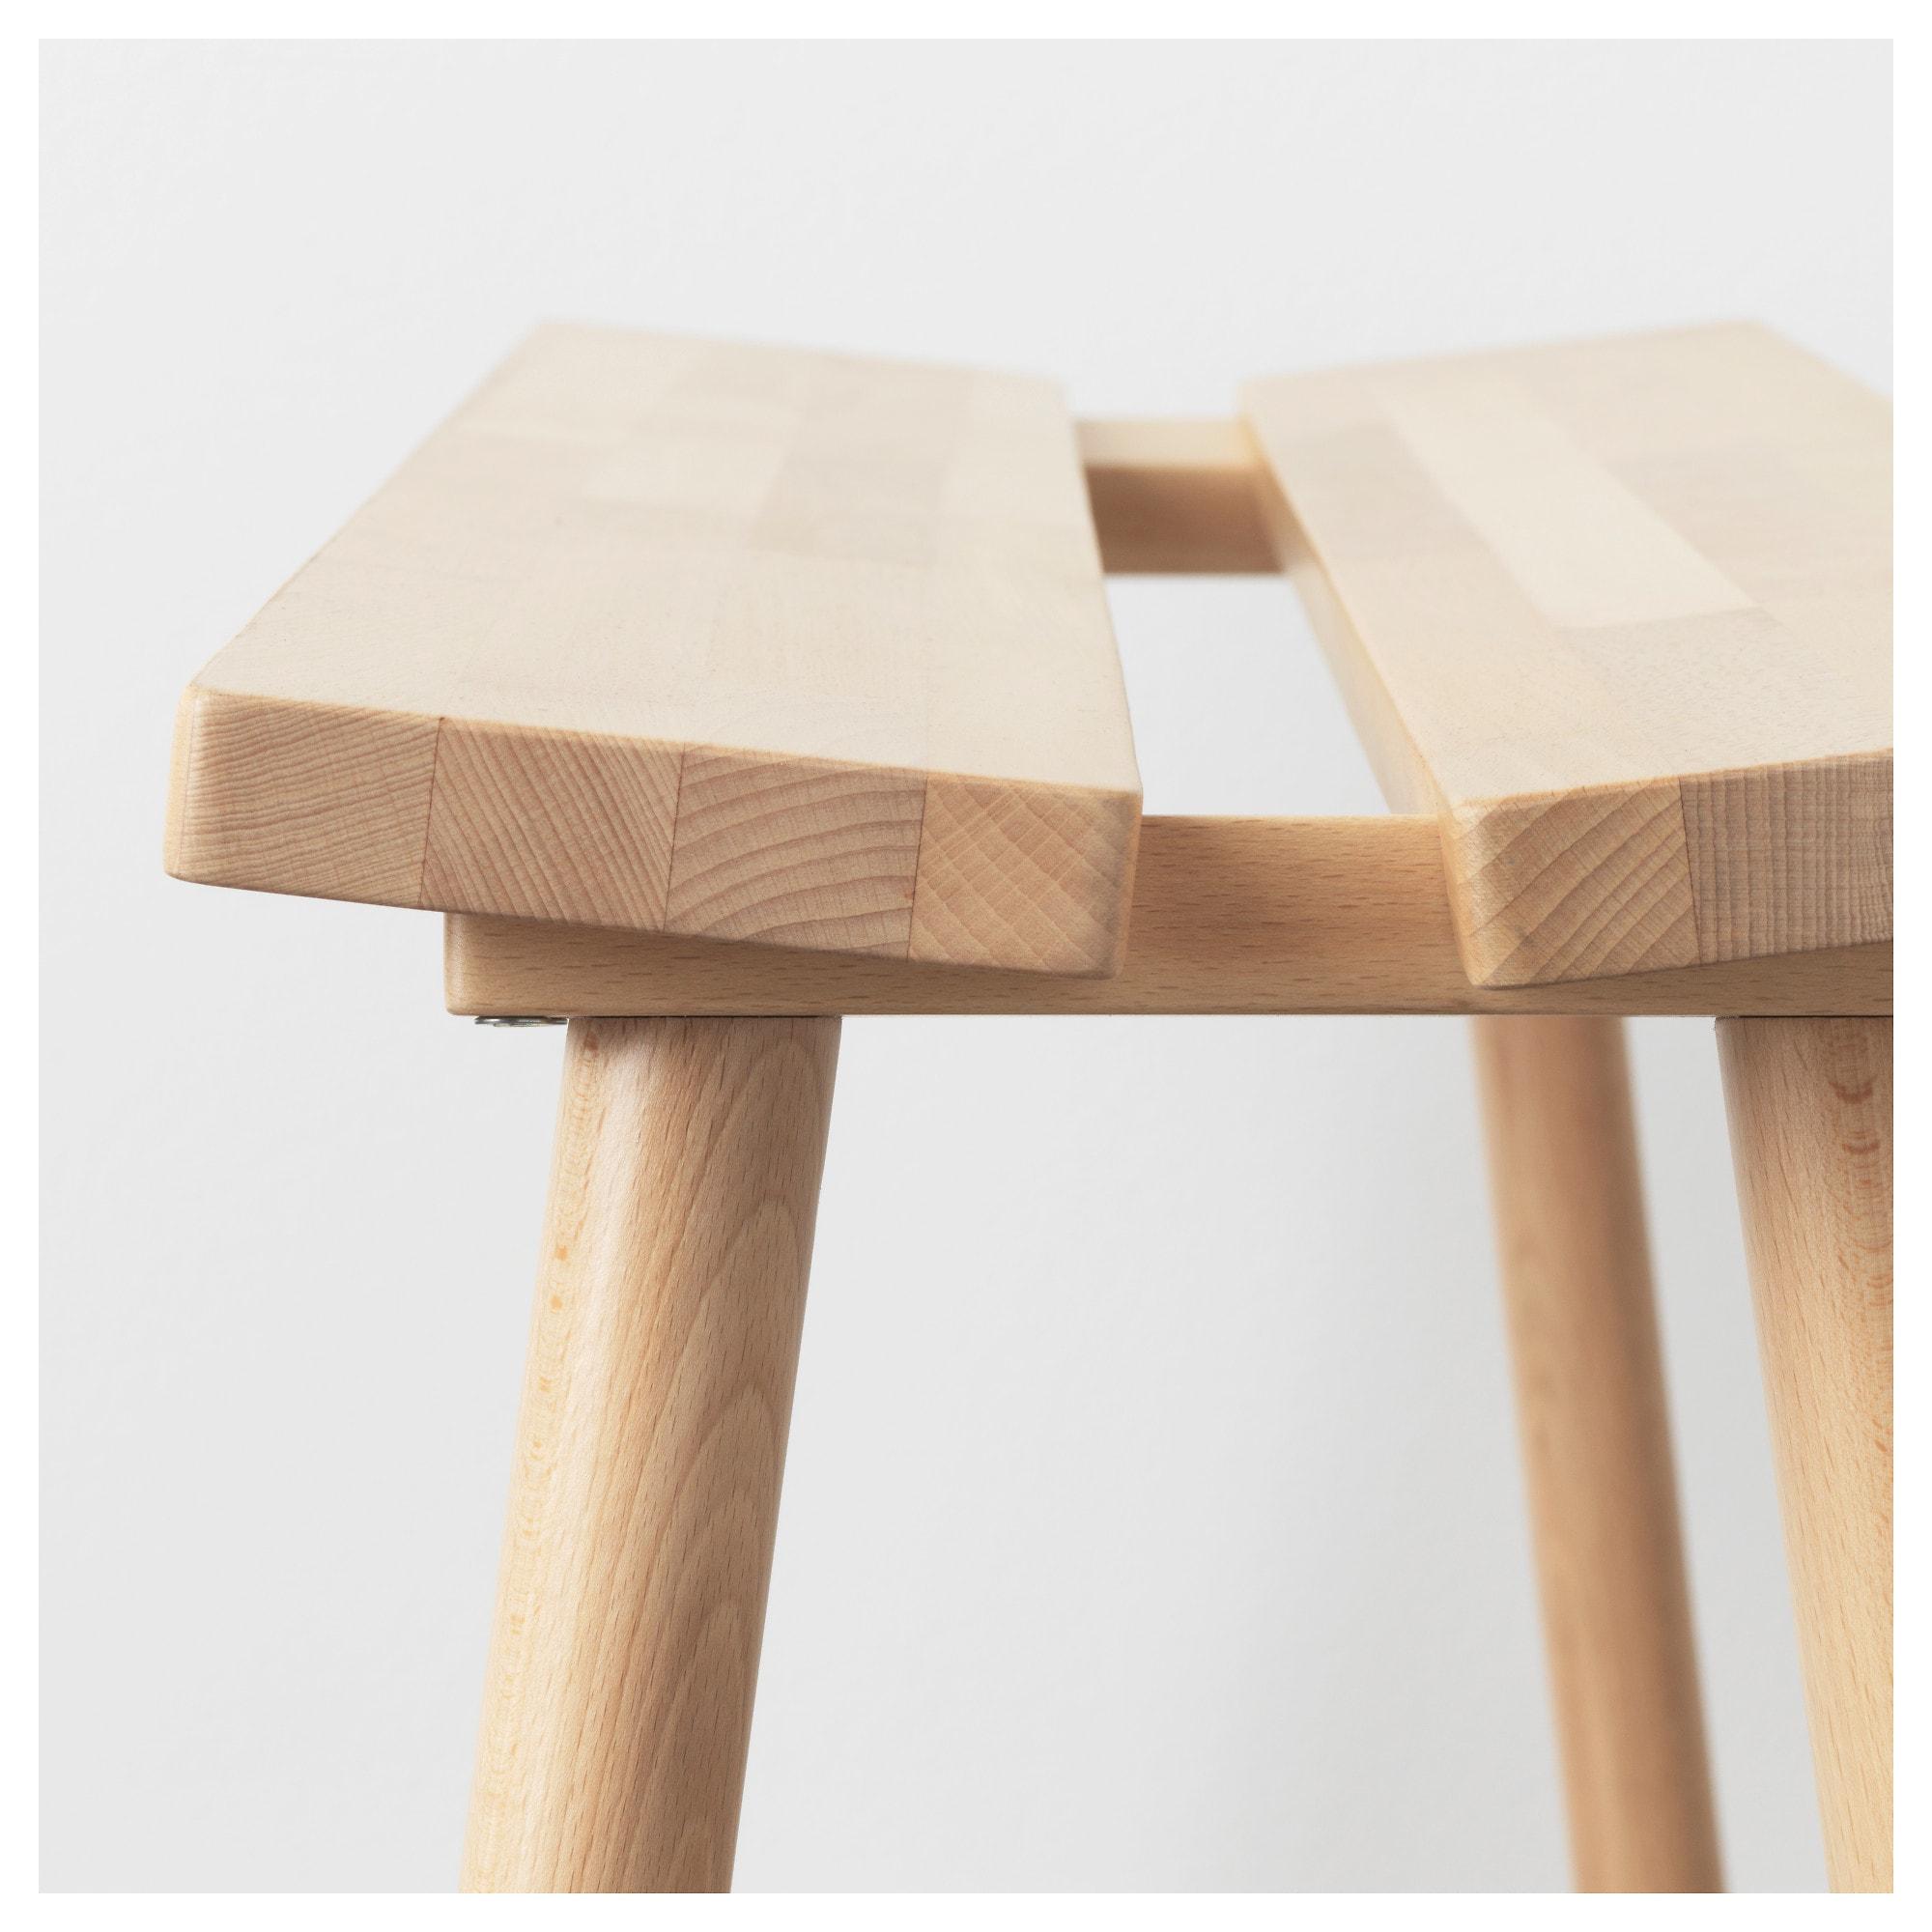 YPPERLIG Bench Beech 100 cm - IKEA